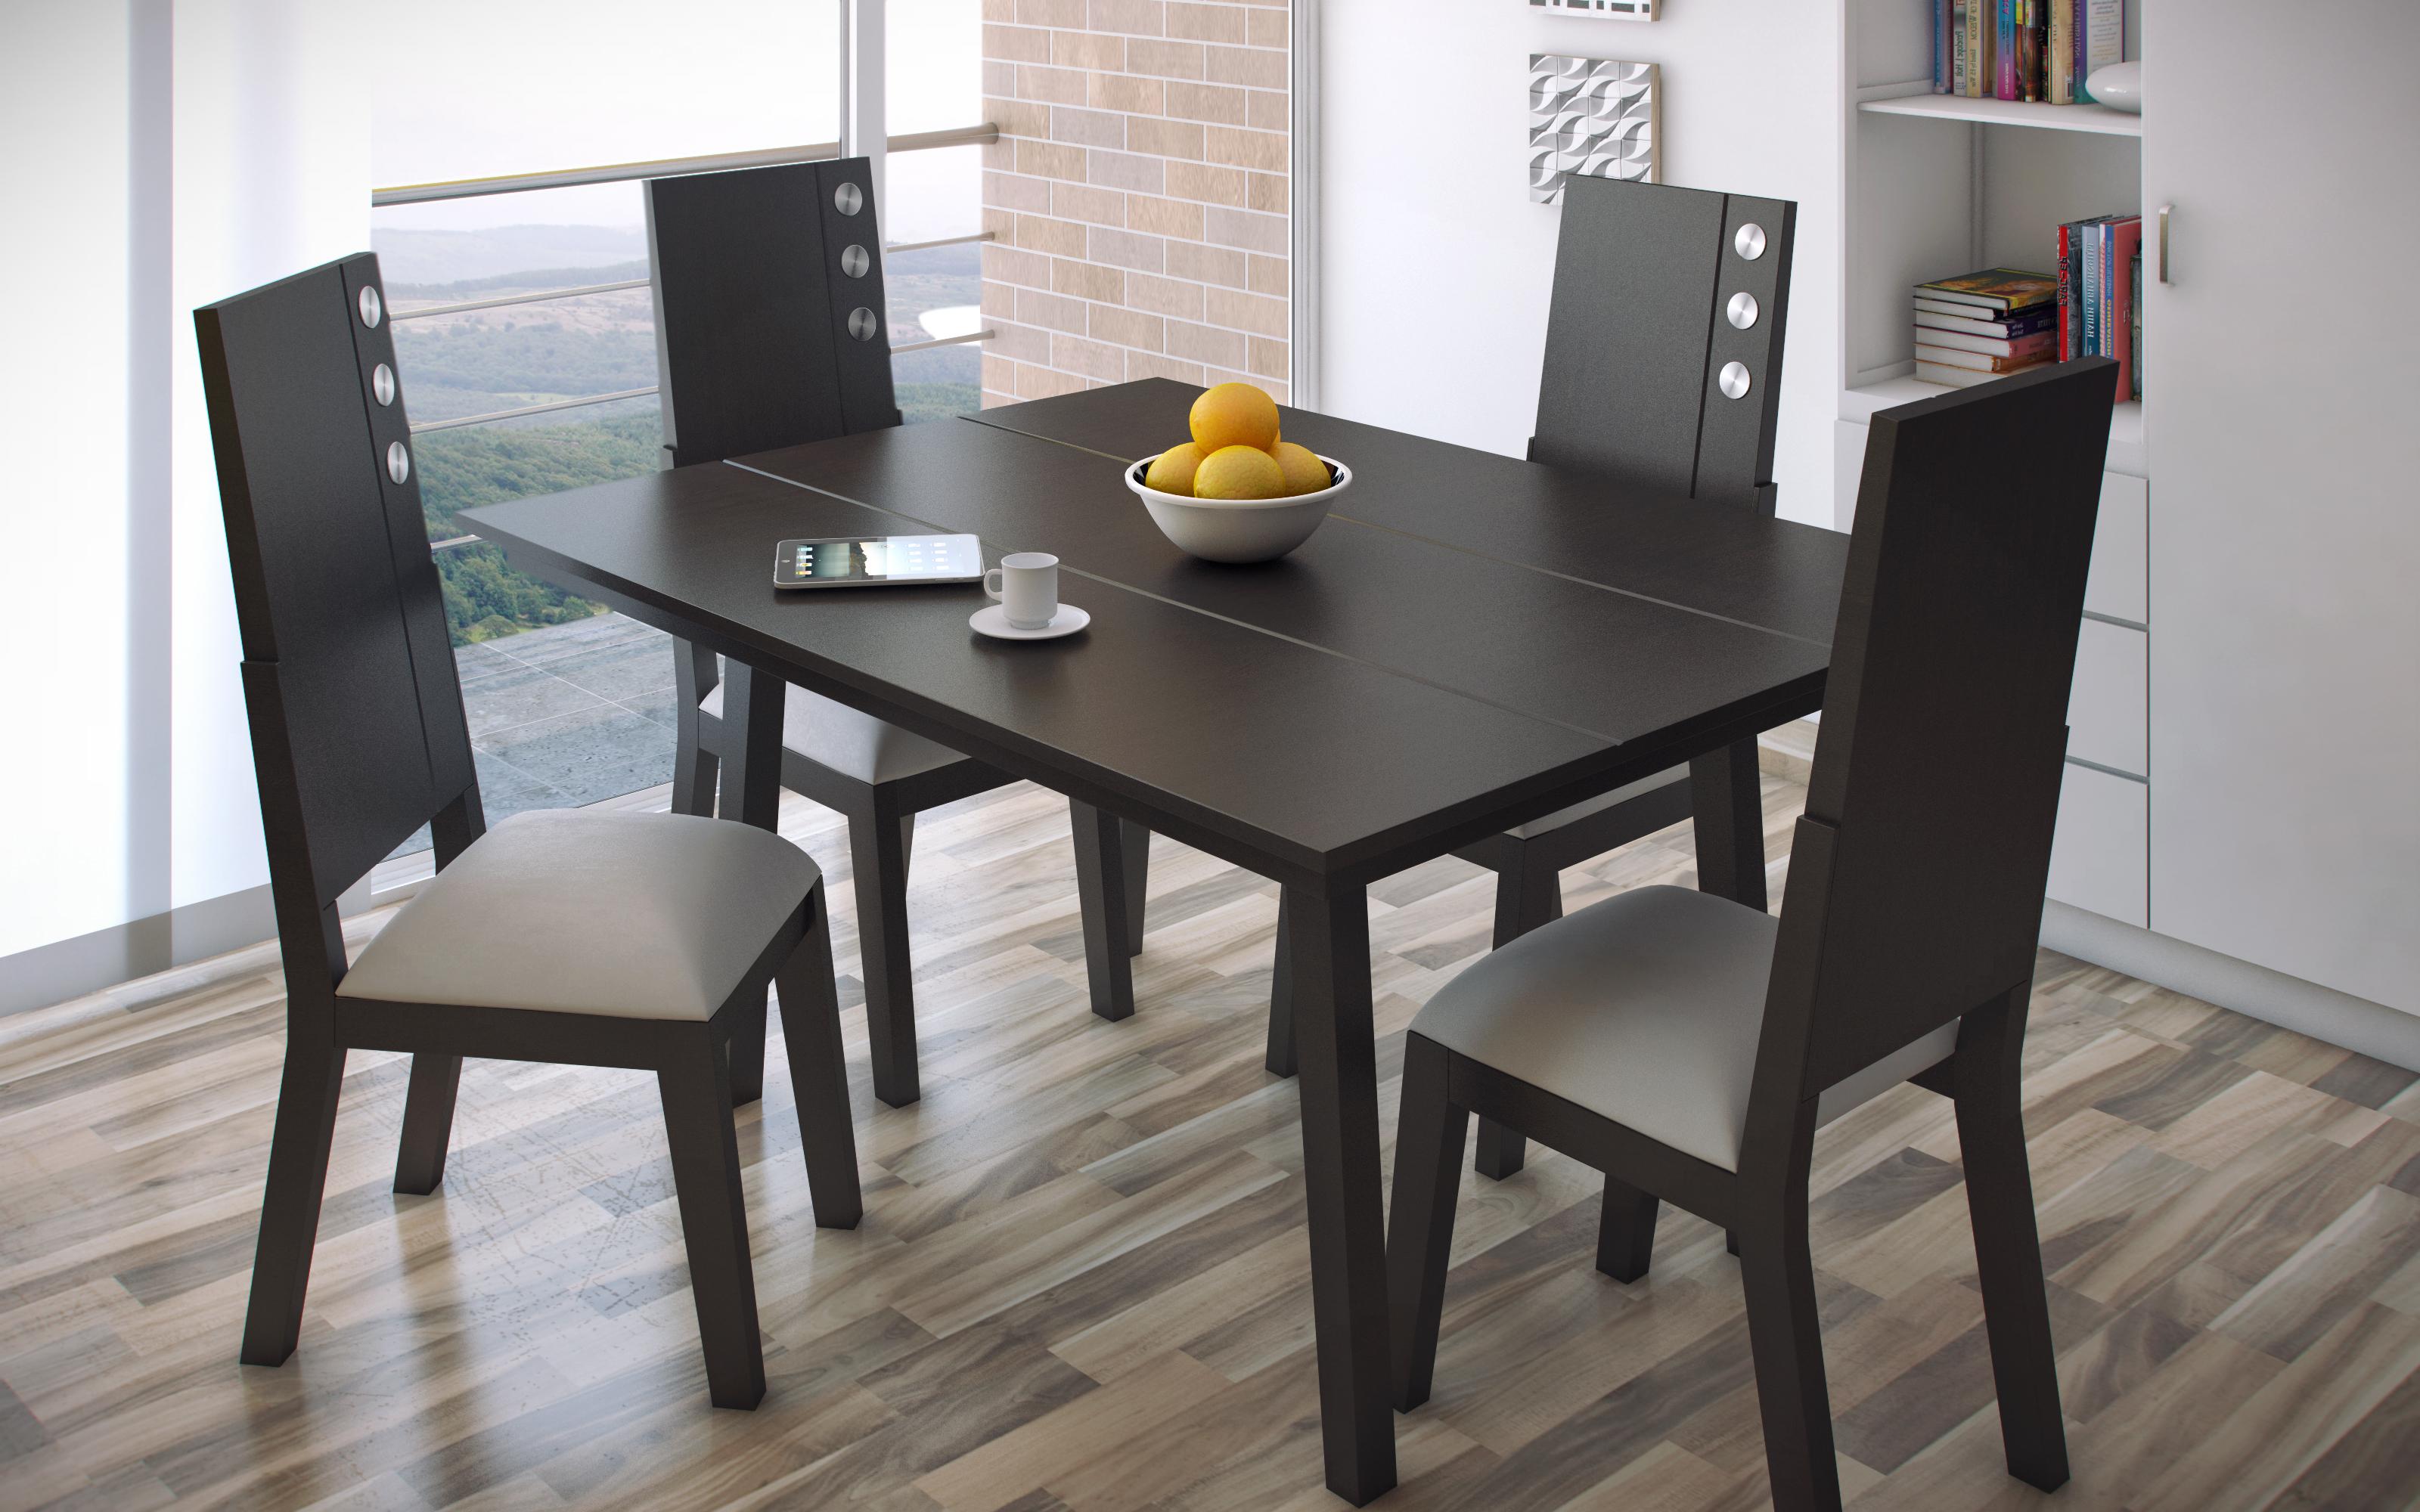 Comedores comedor brasil cuadrado sillas comedores - Sillas para comedores ...